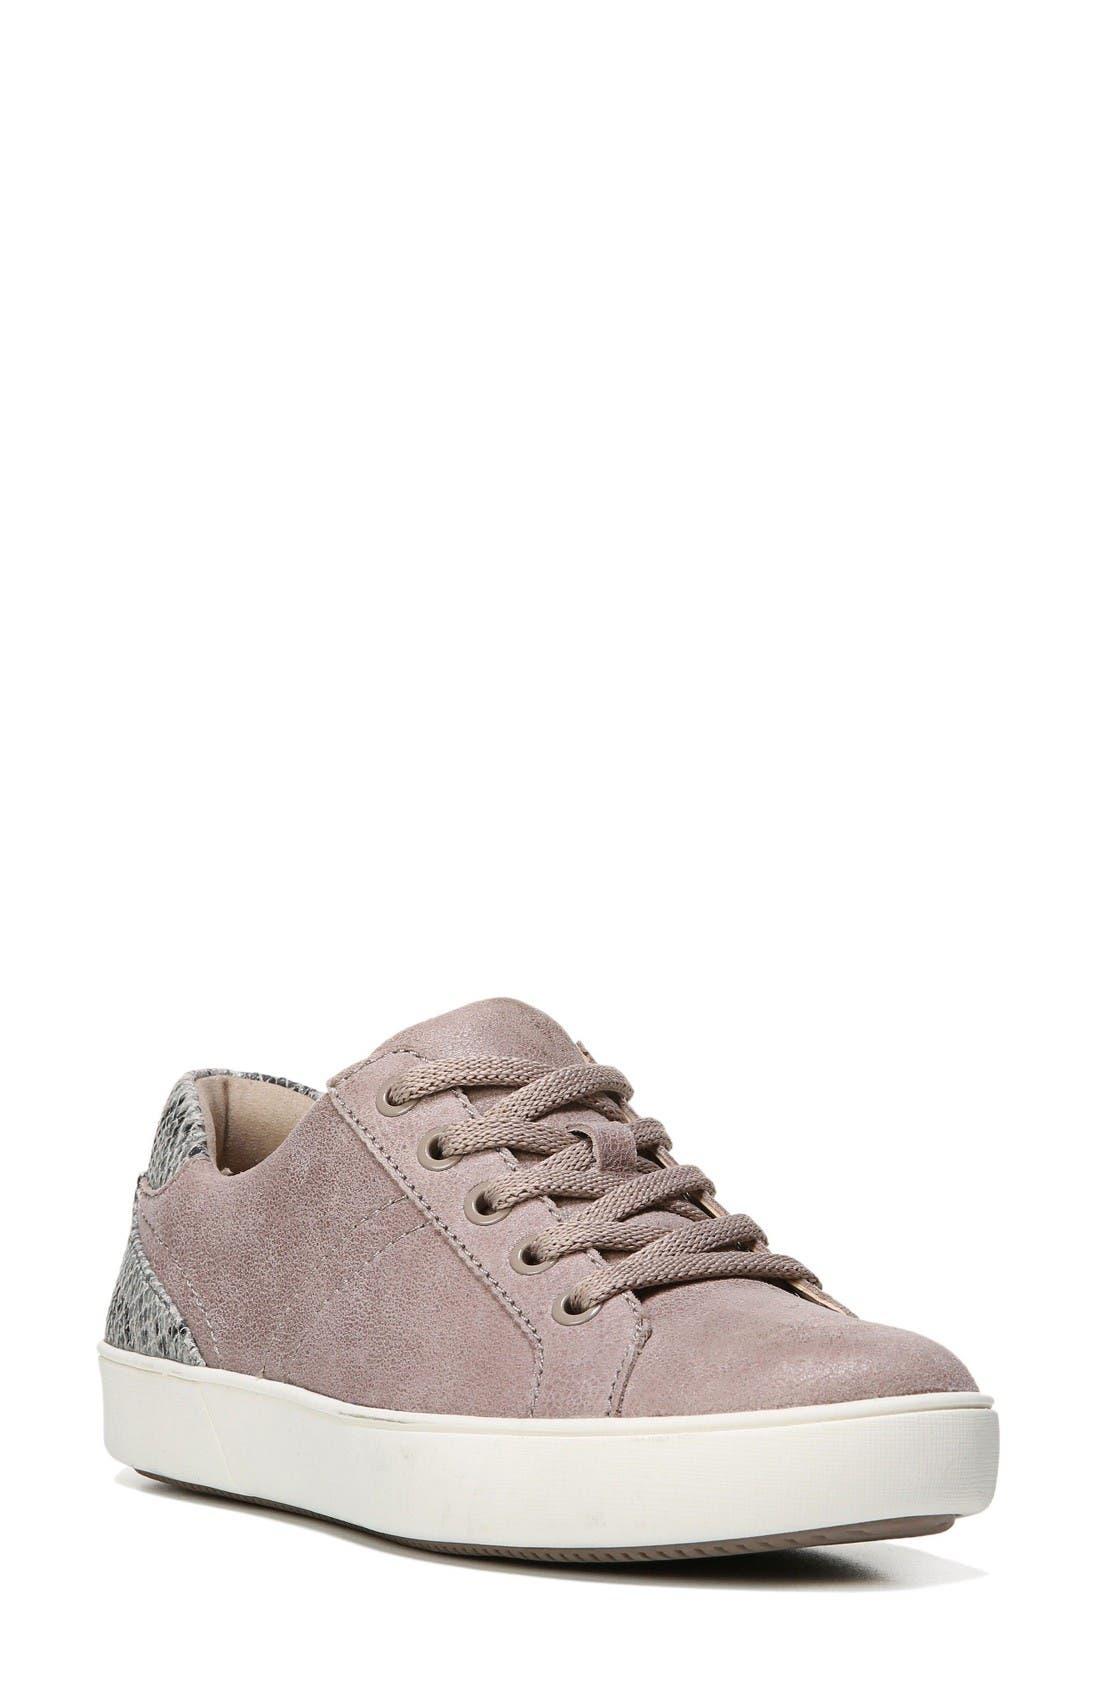 Alternate Image 1 Selected - Naturalizer Morrison Sneaker (Women)